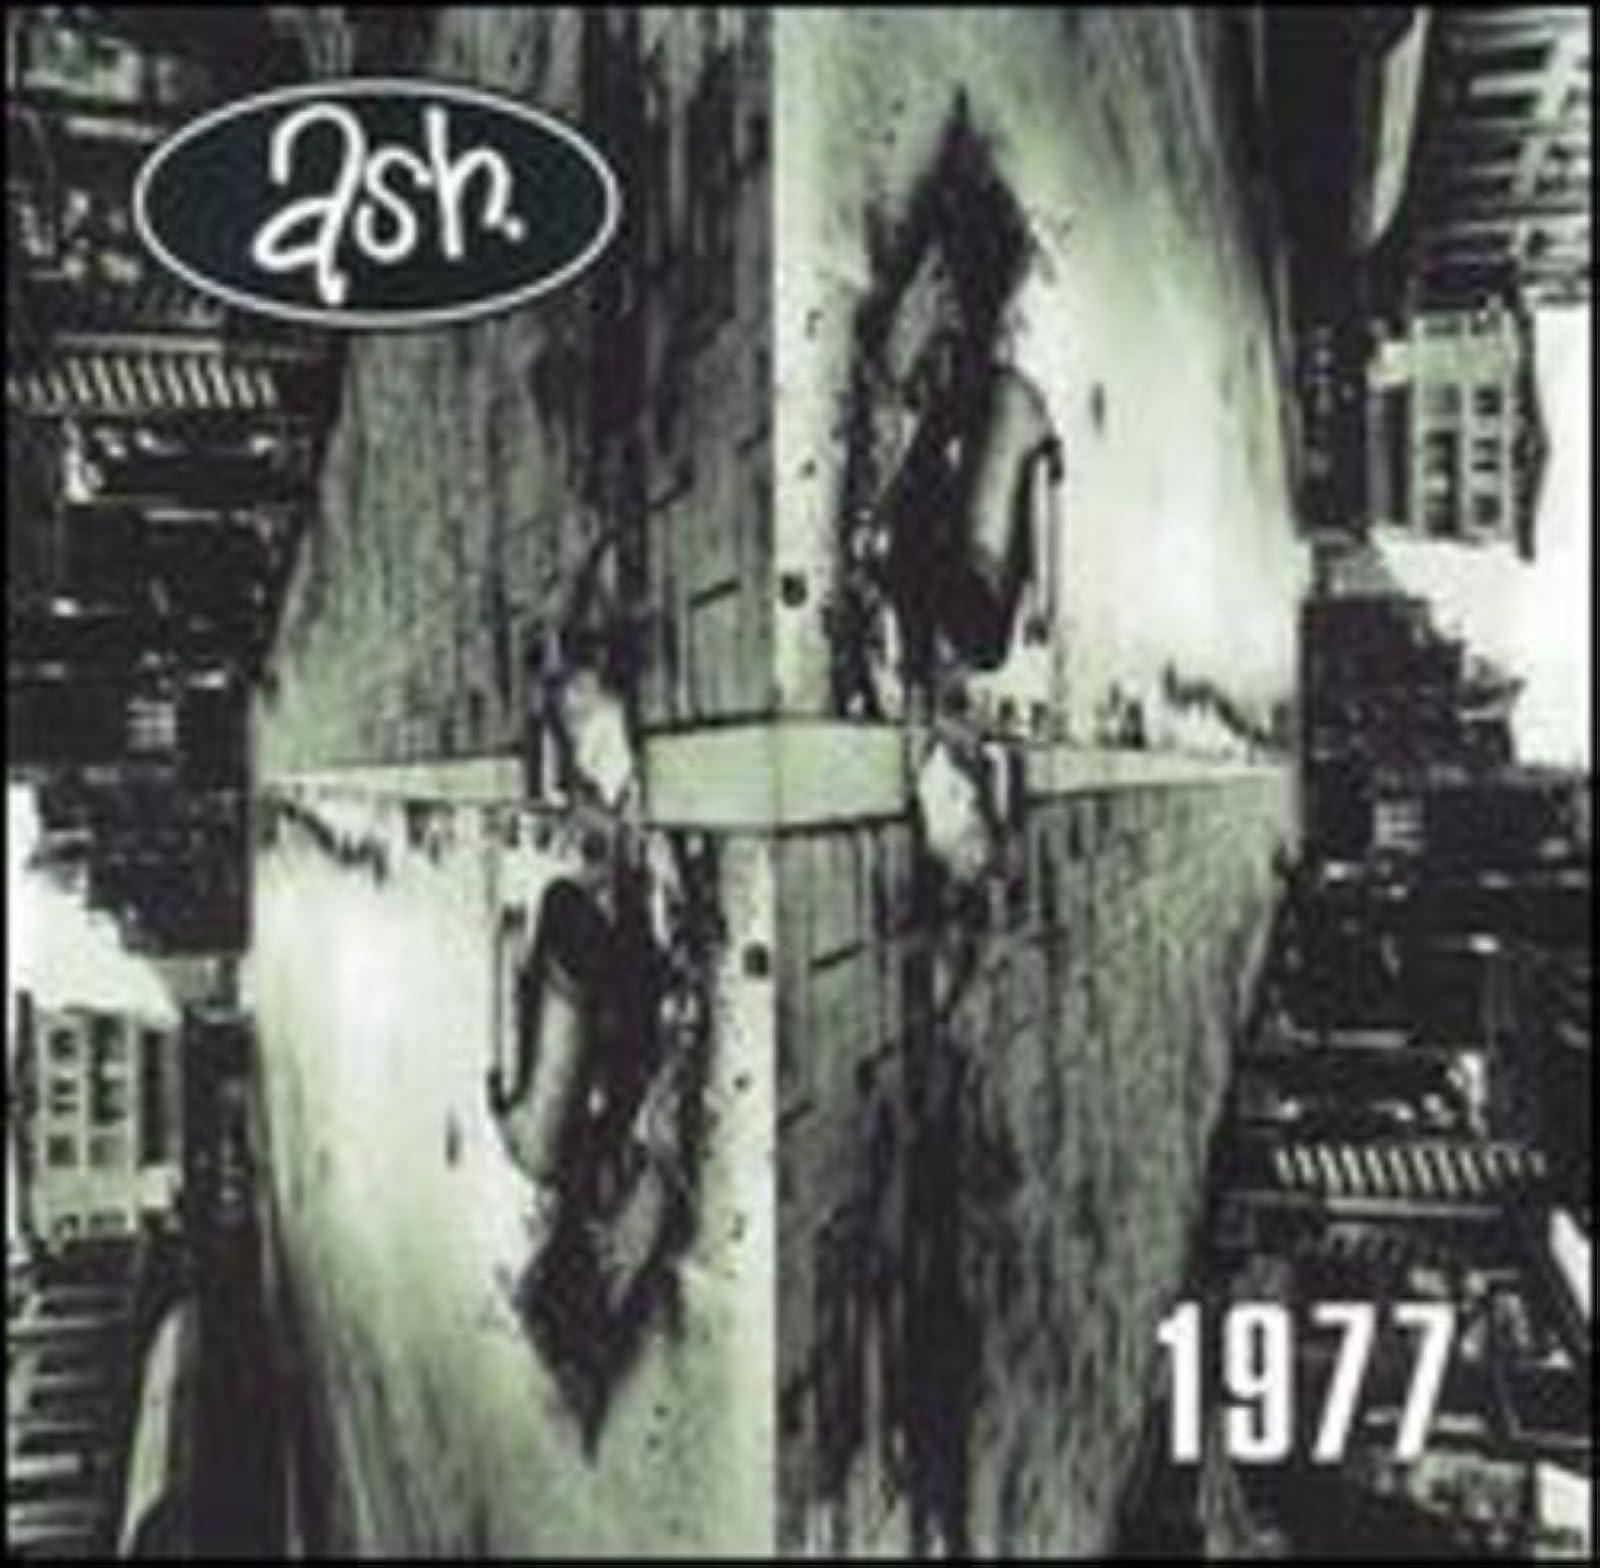 1977 By Ash On Audio CD Album 2011